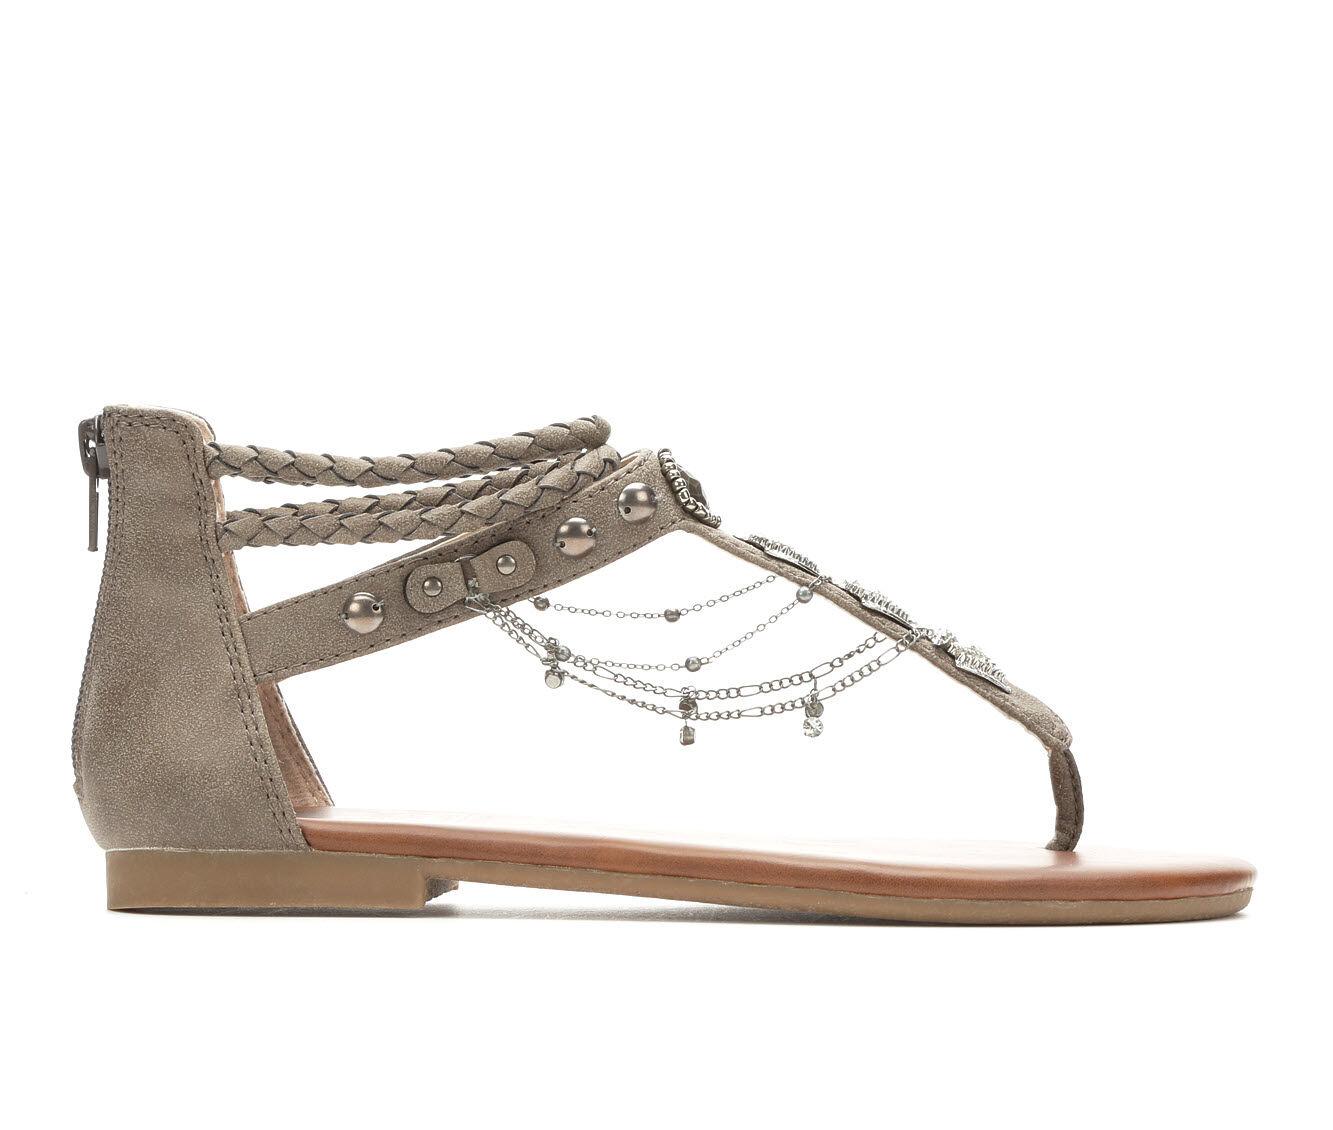 new style Women's Jellypop Cava Flat Sandals Slate